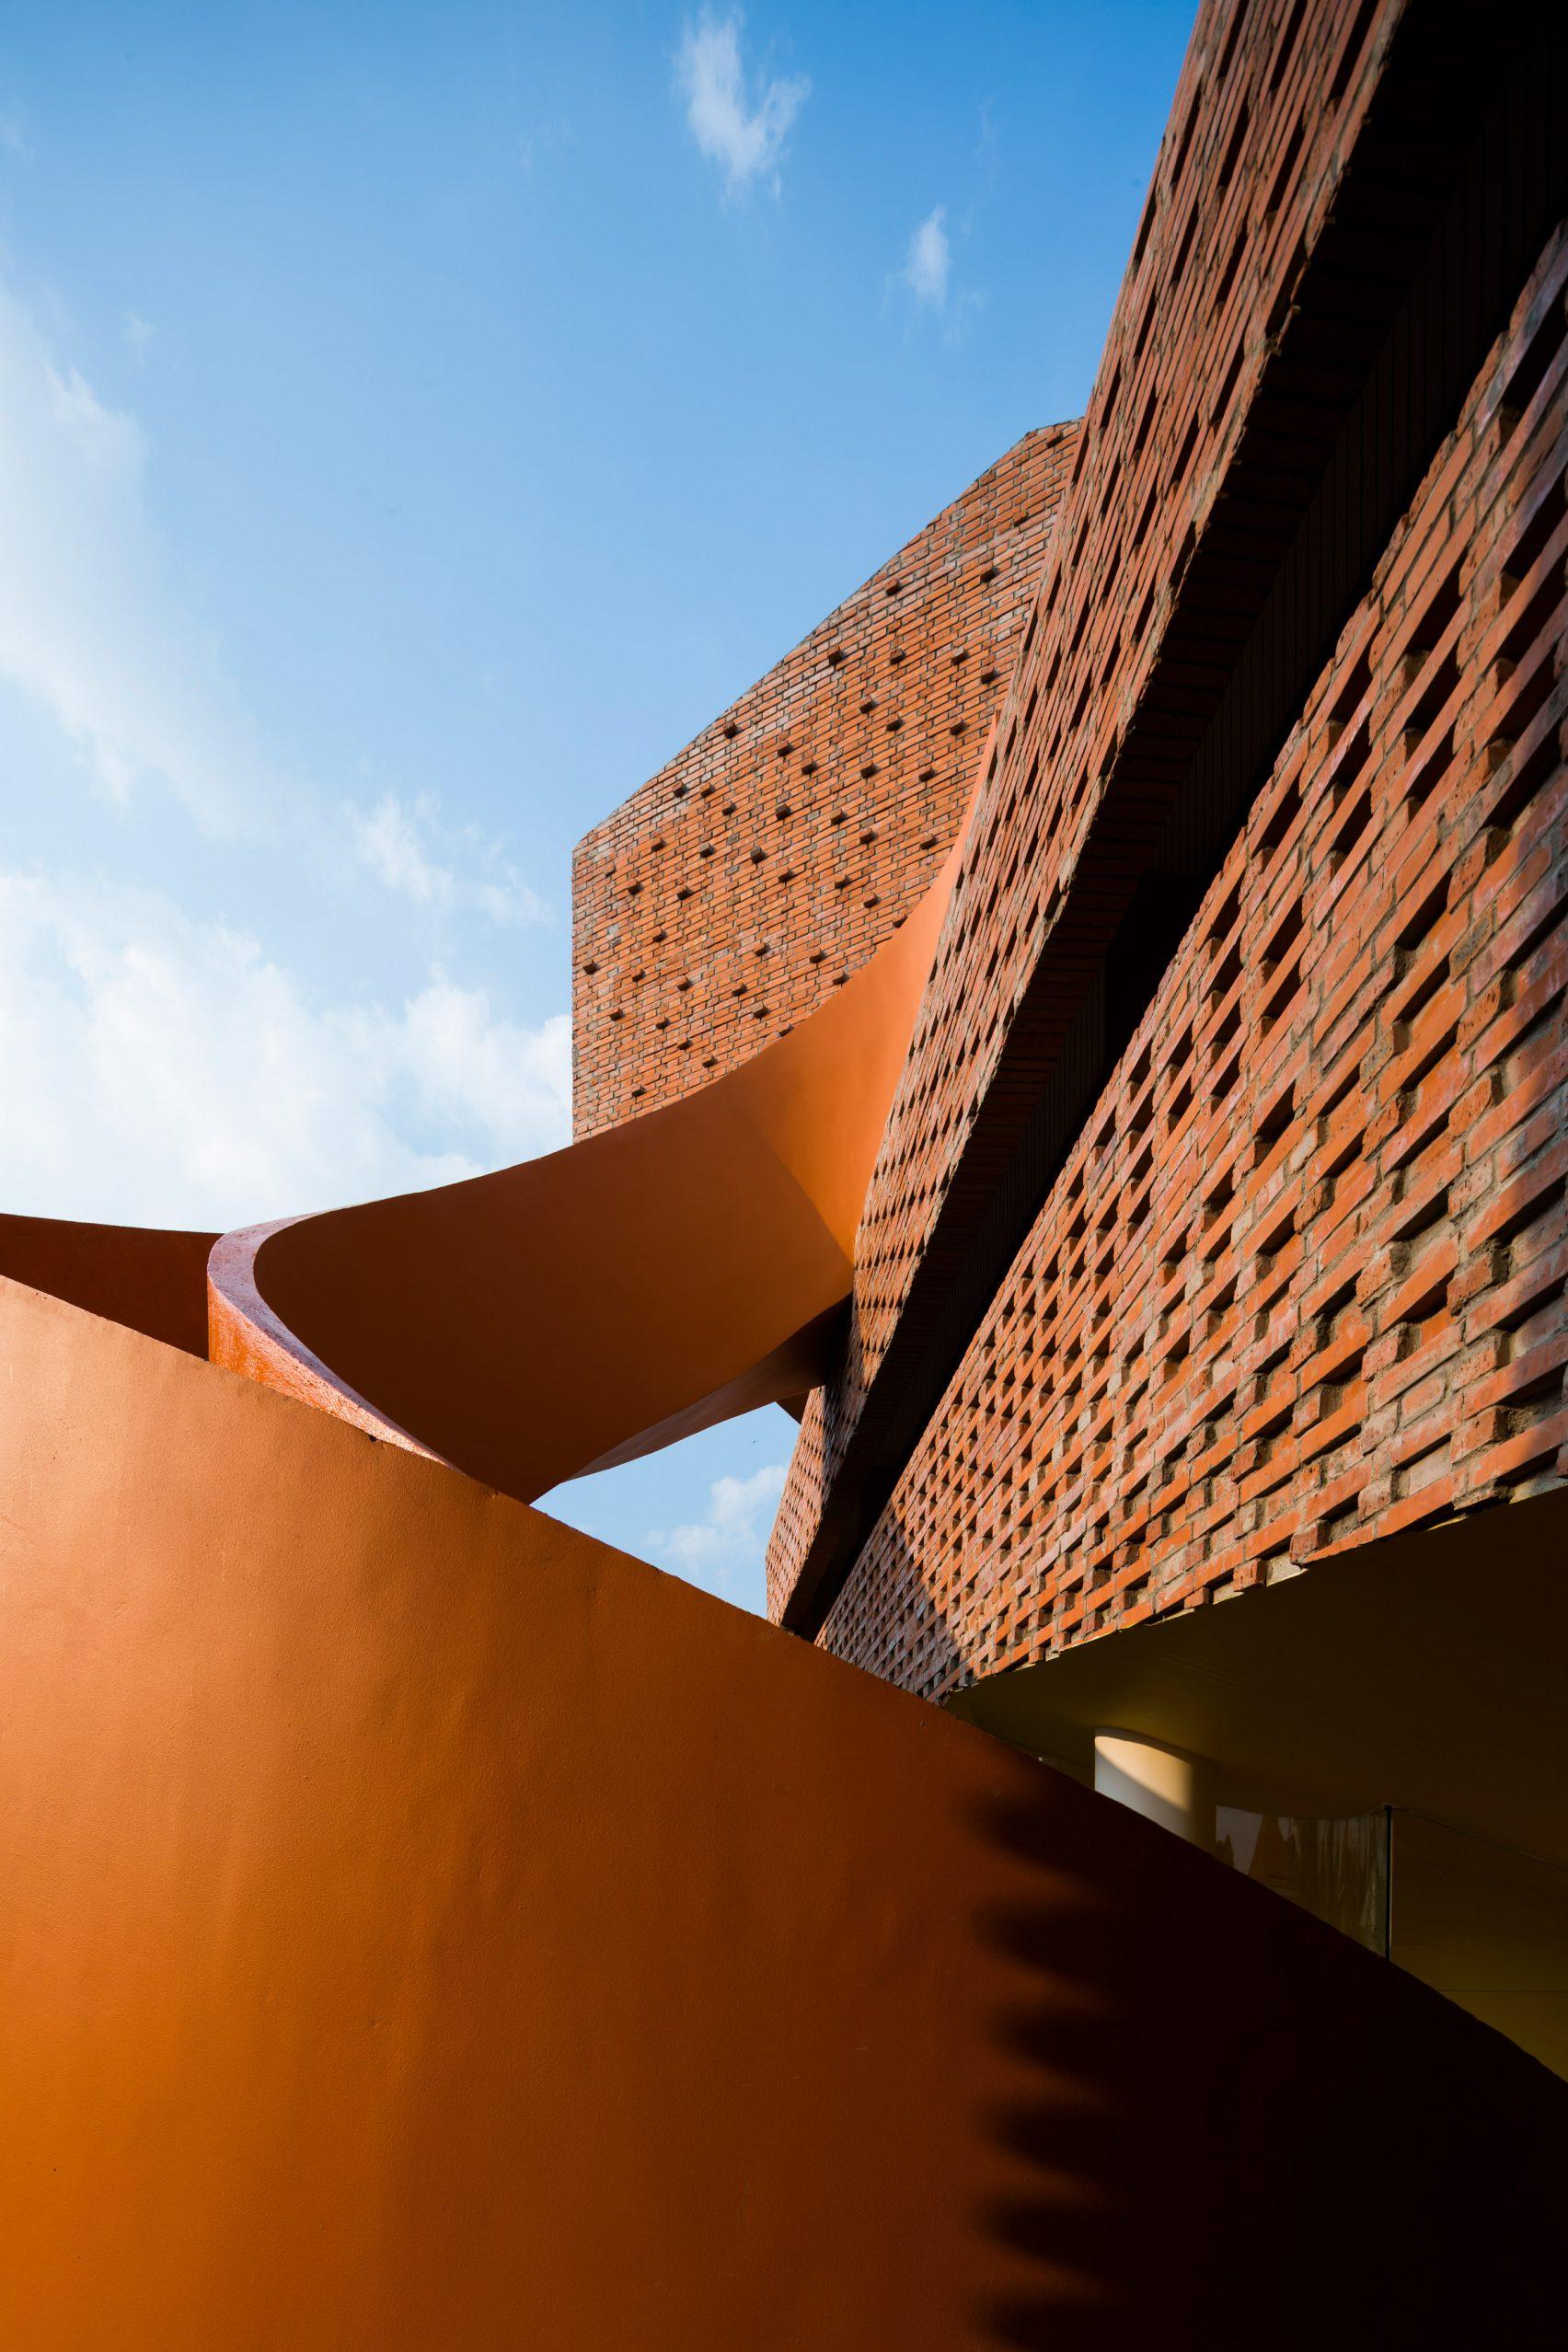 chuon-chuon-kim-kindergarten-kientruc-o-architecture-education-vietnam_dezeen_2364_col_21-1704x2556.jpg